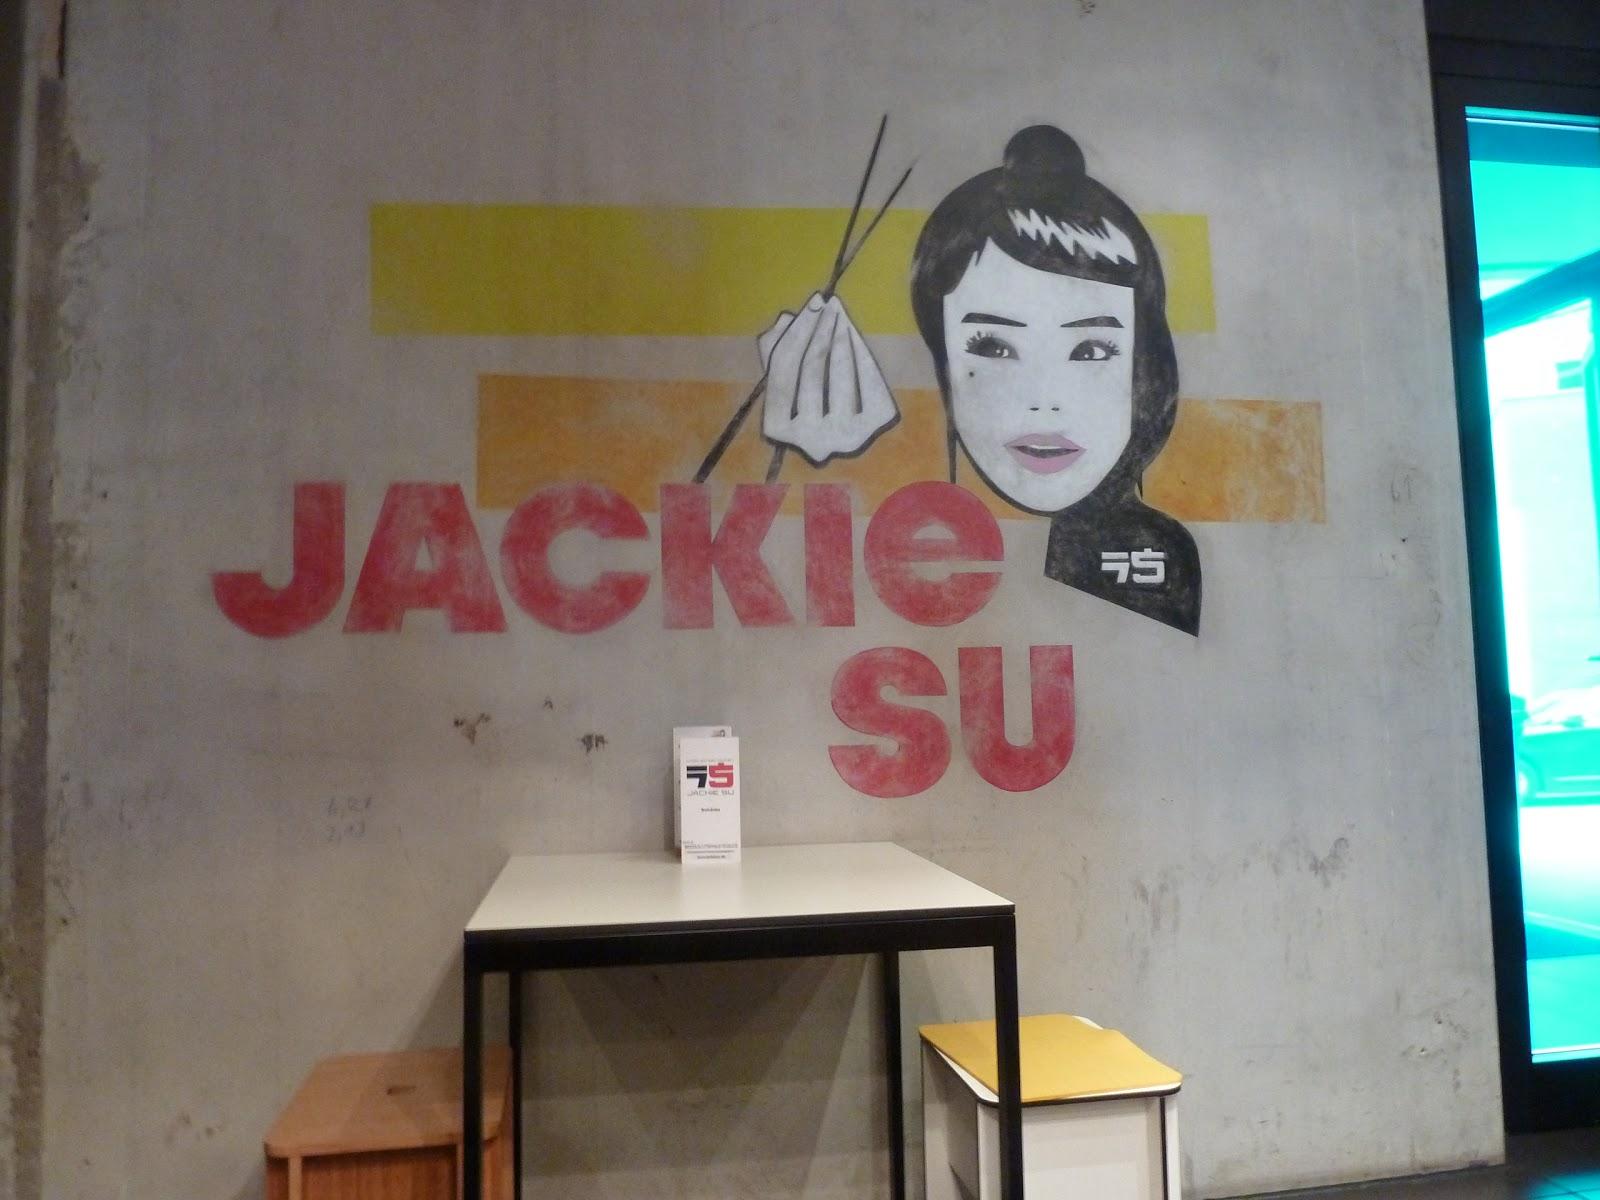 hauptstadtgenuss jackie su urban street kitchen. Black Bedroom Furniture Sets. Home Design Ideas